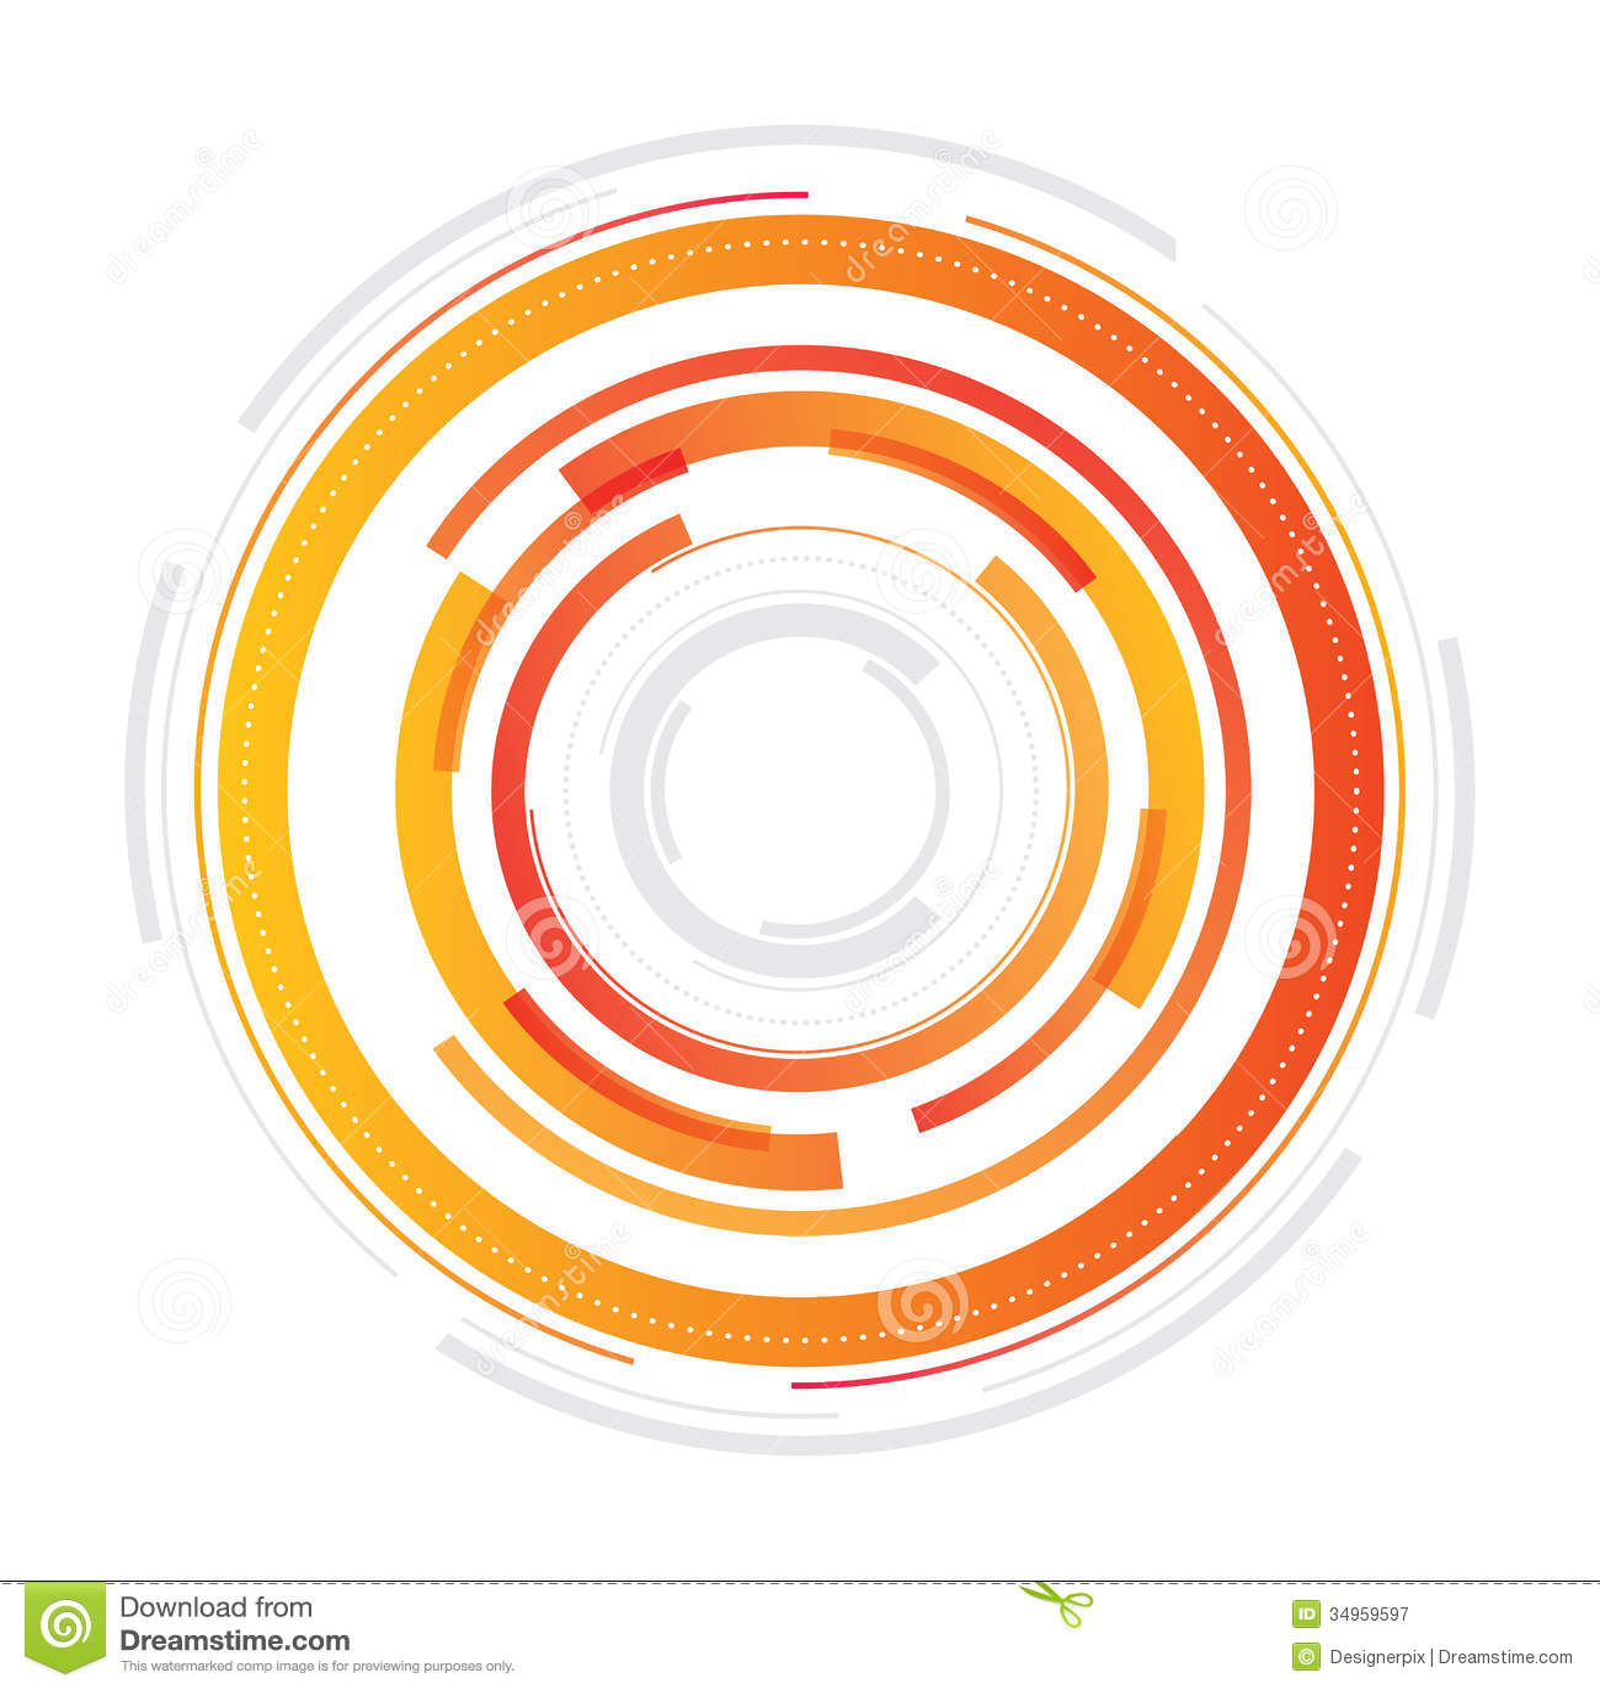 abstract design circle sector - photo #1